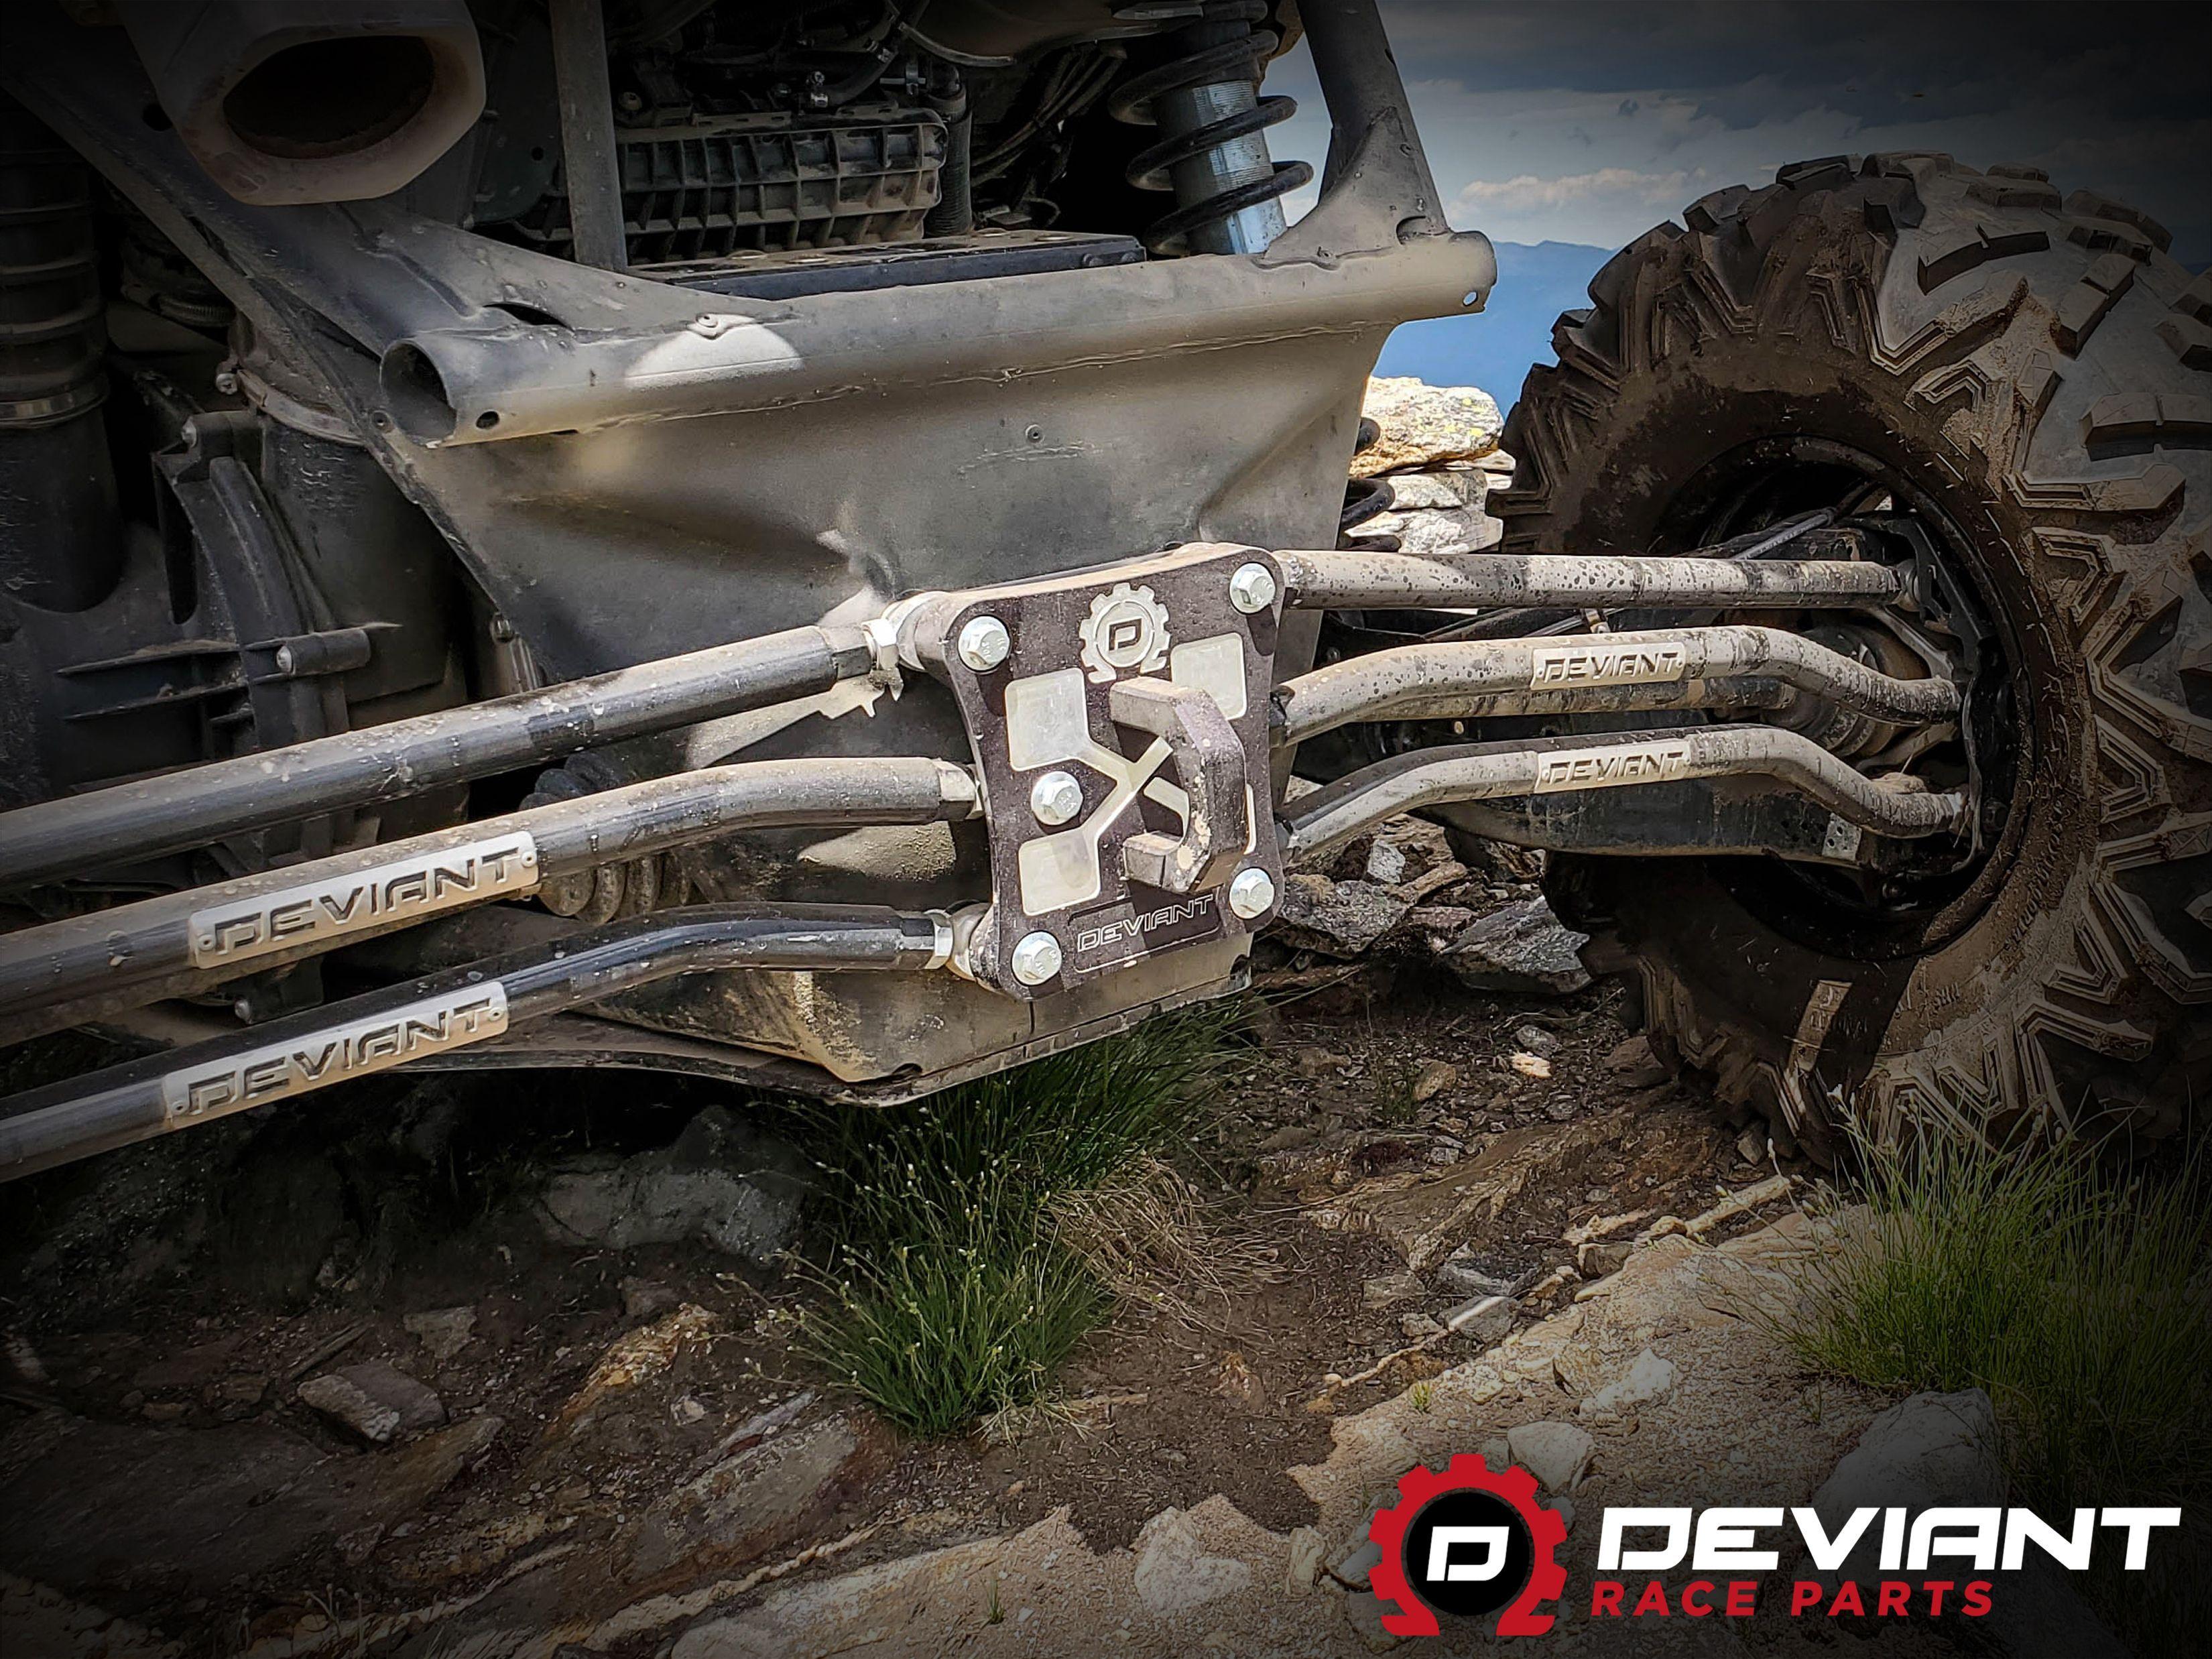 Canam maverick x3 heavyduty rear end complete with a